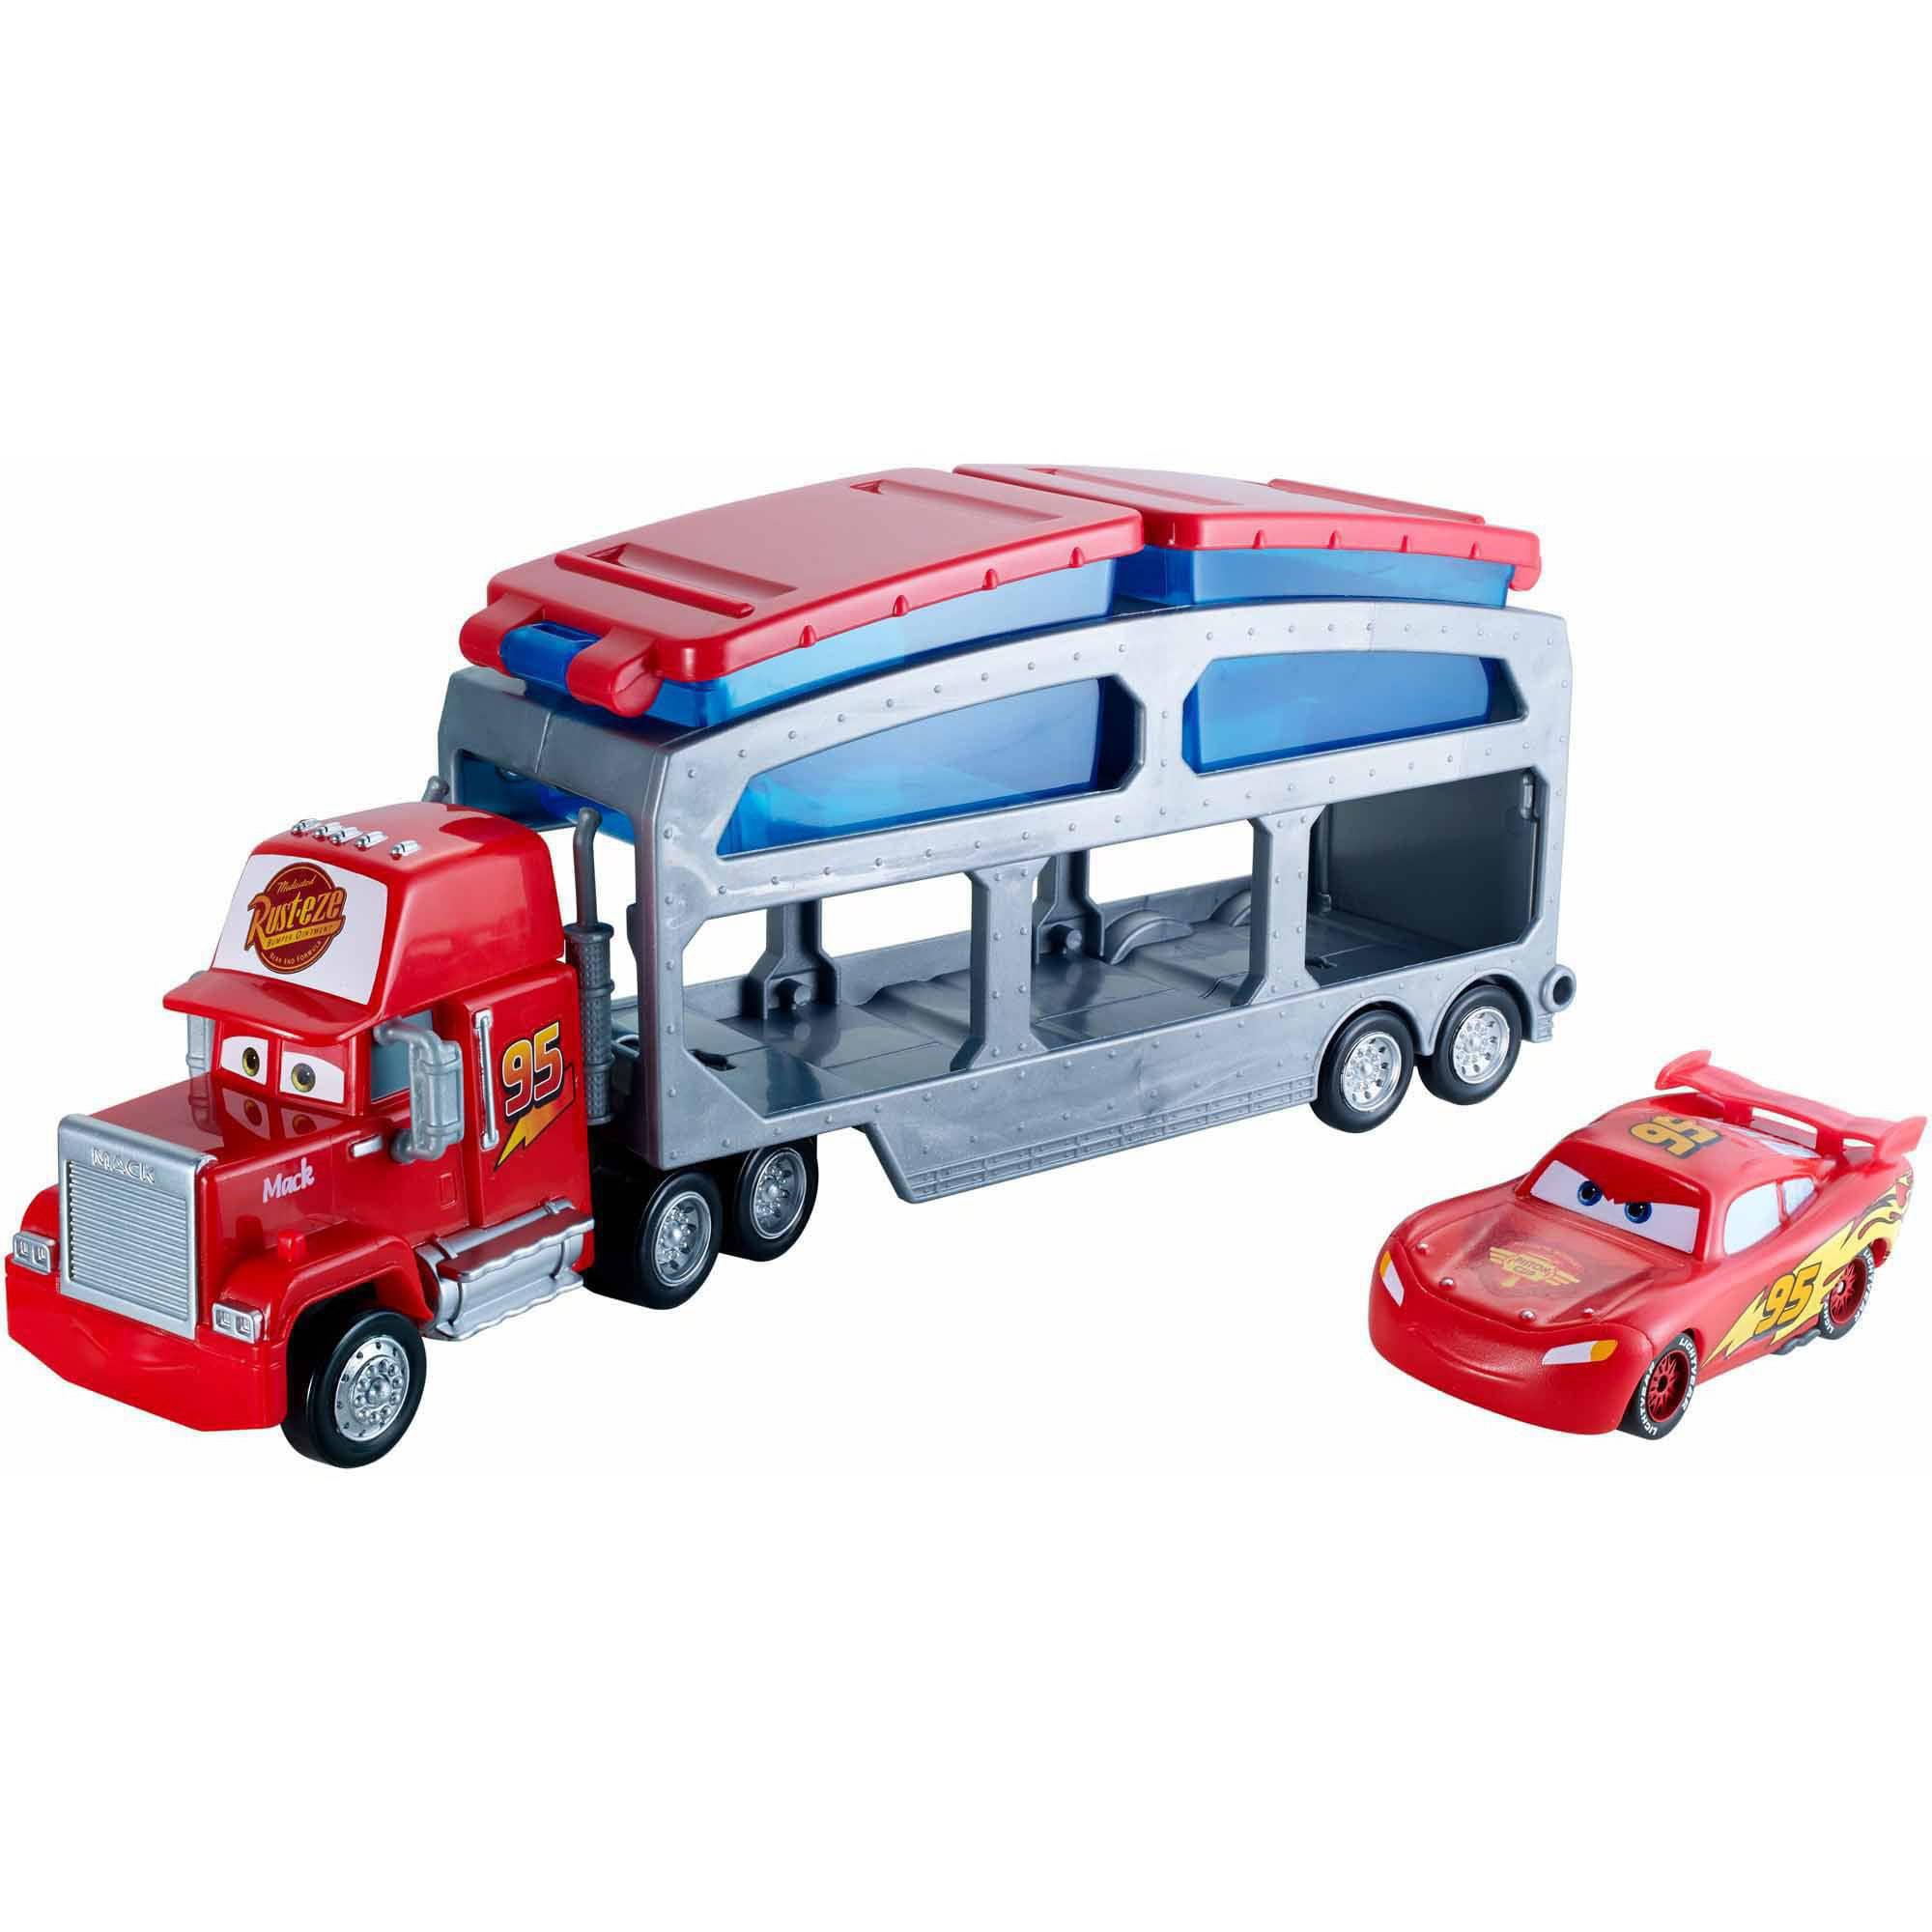 Disney/Pixar Cars Mack Dip And Dunk Trailer - Walmart.com